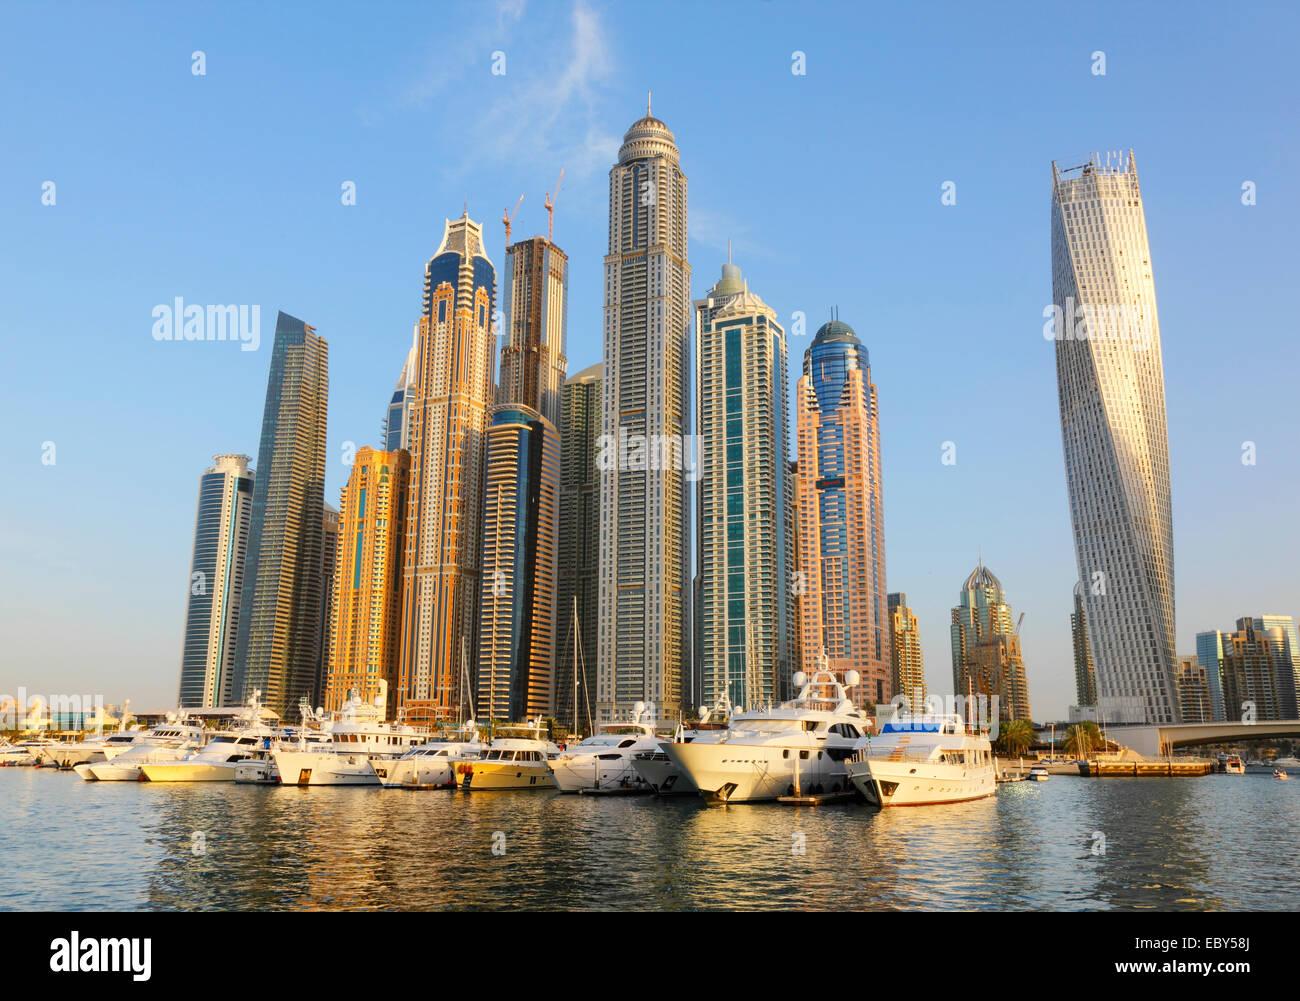 Dubai Marina waterfront - Stock Image